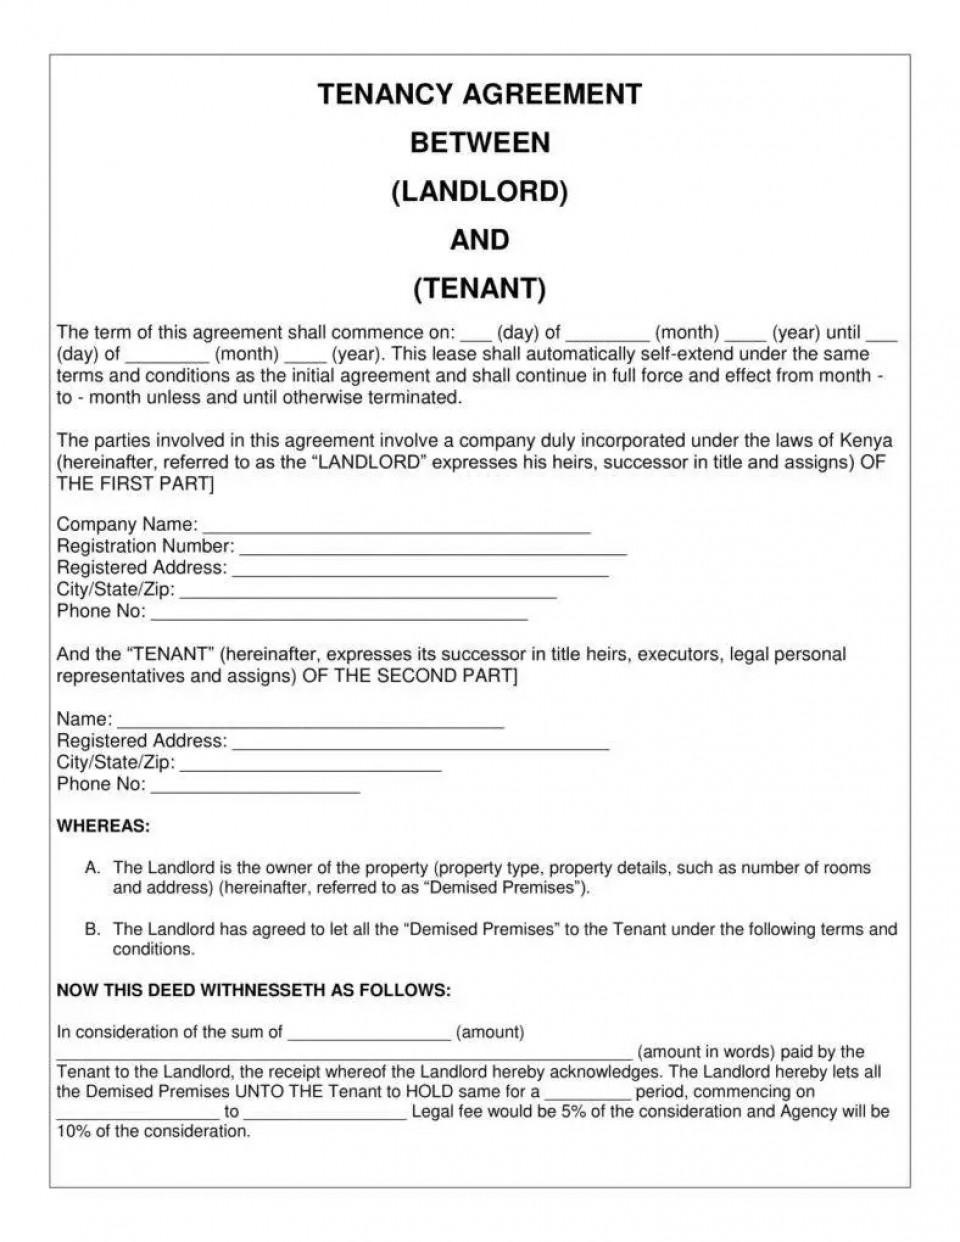 008 Impressive Basic Rental Agreement Template High Resolution  Simple Word Tenancy Free960